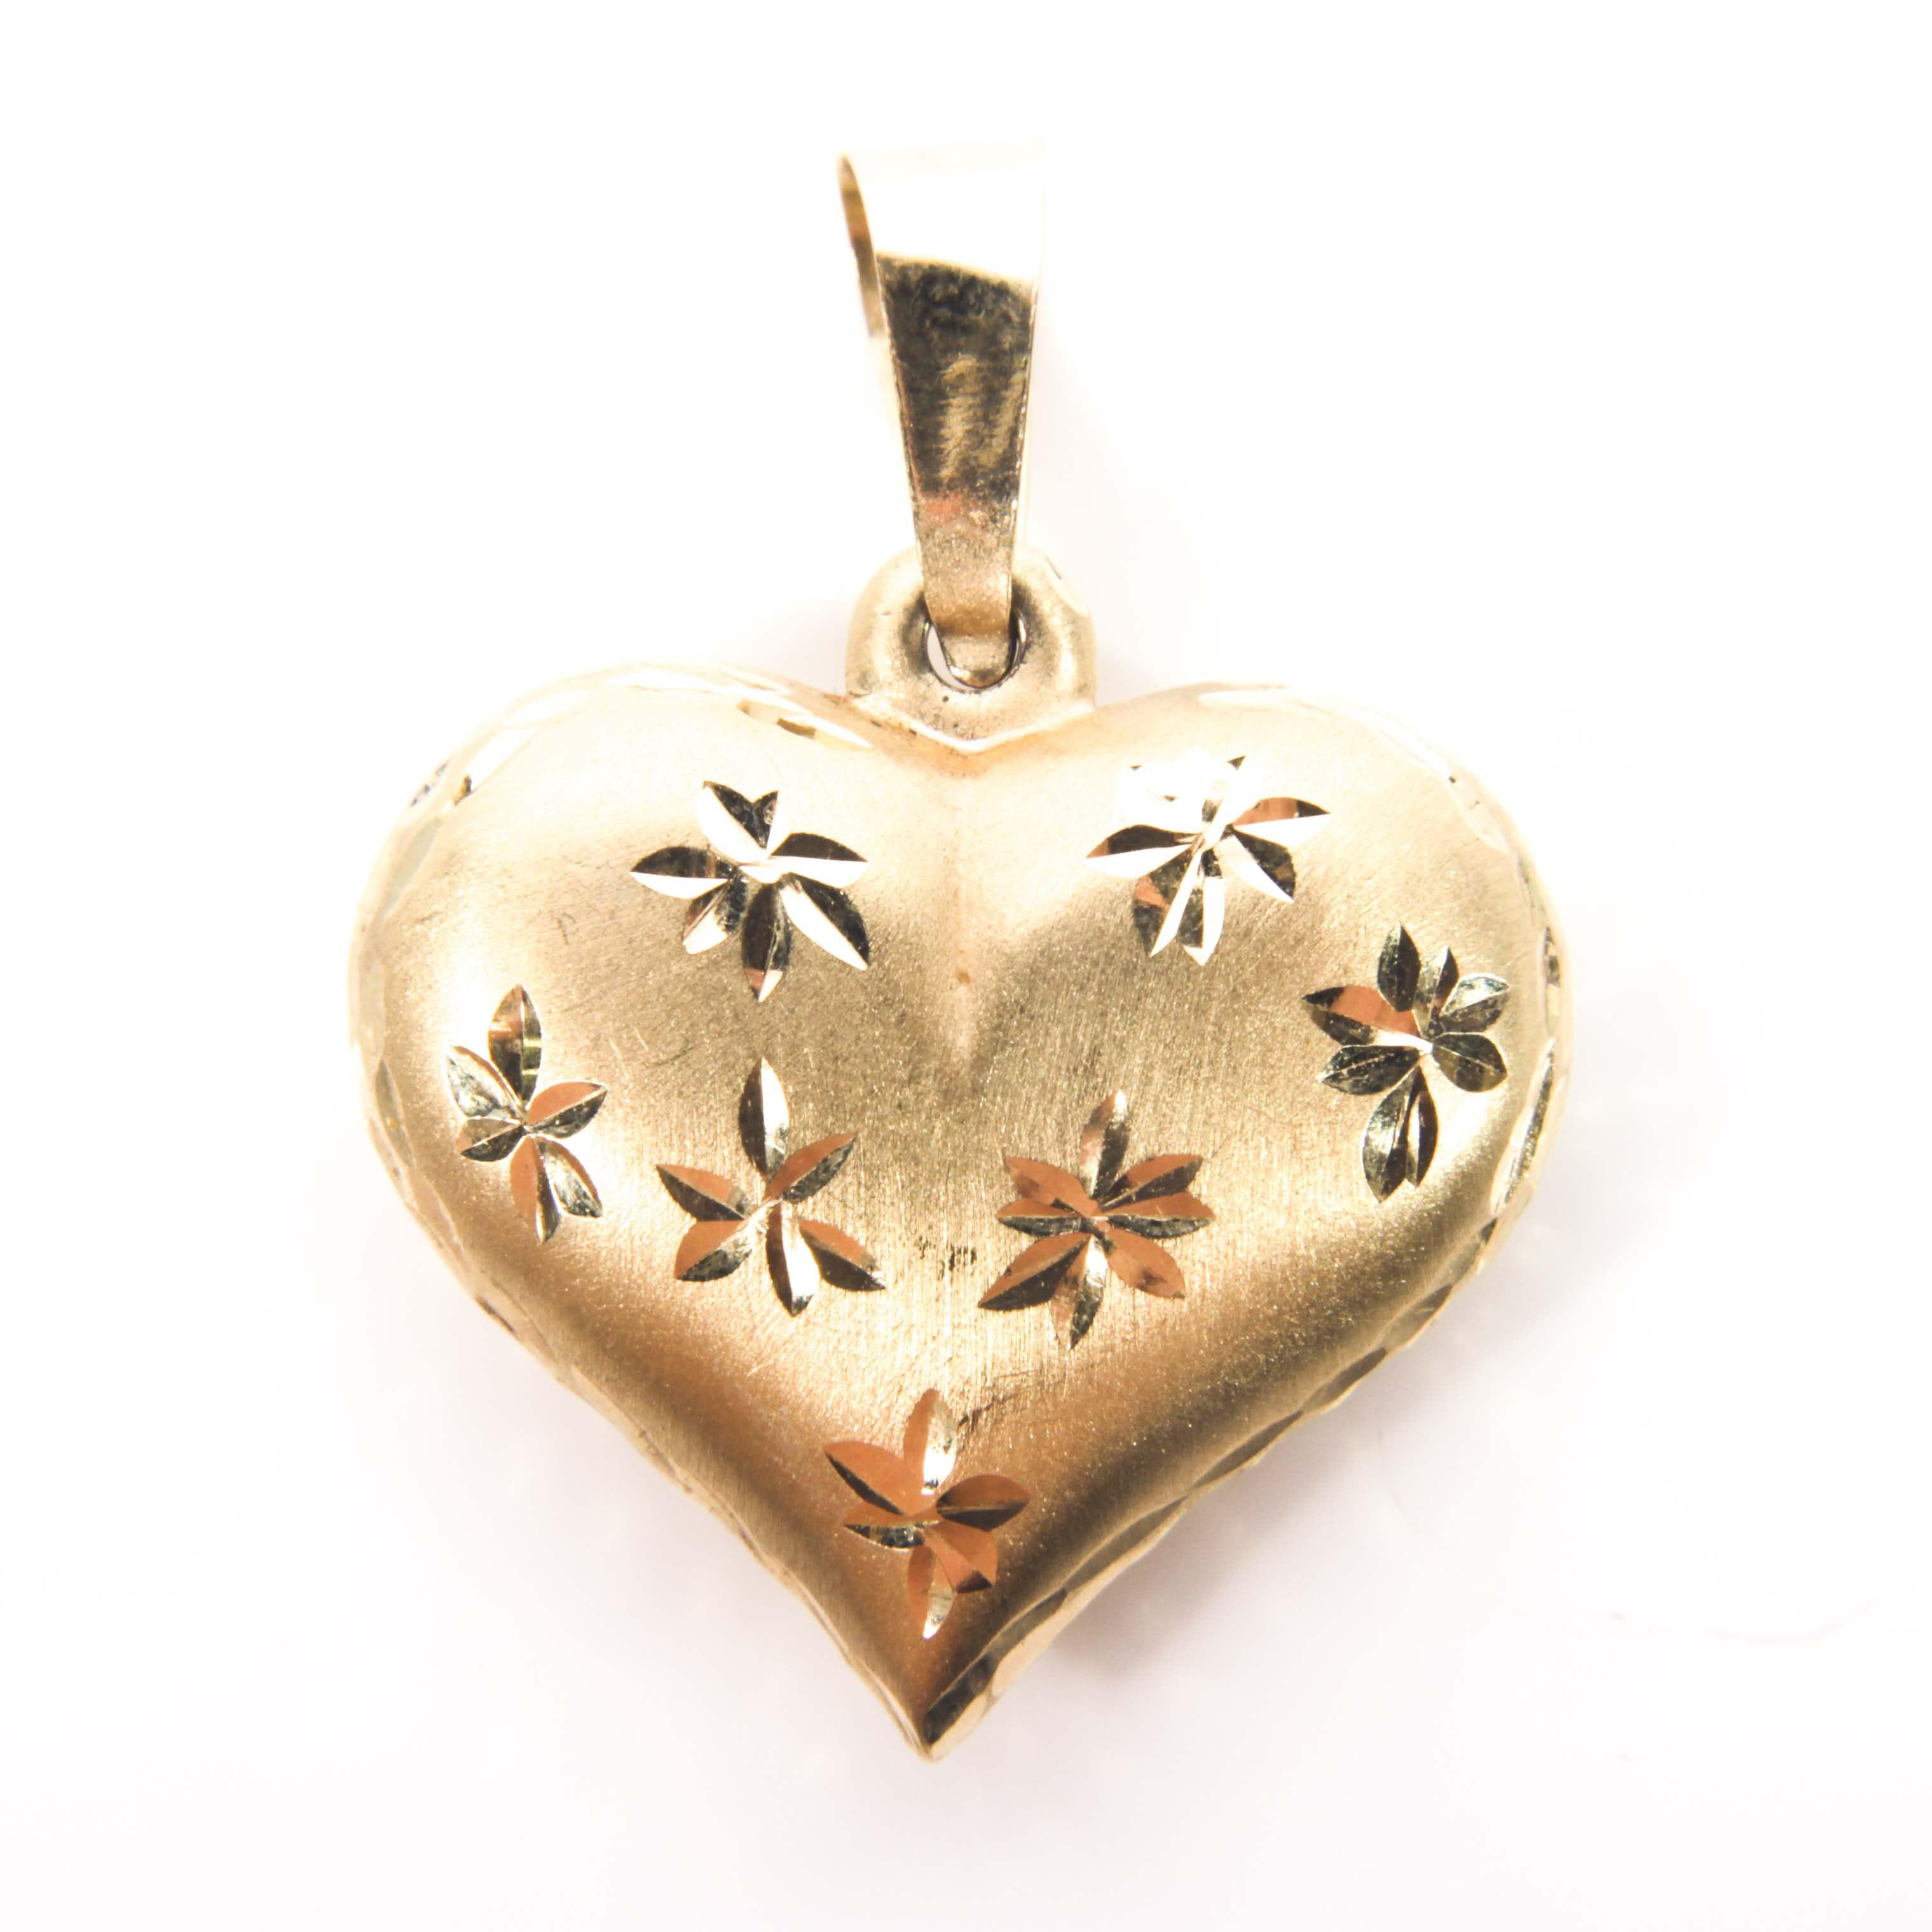 14K Yellow Gold Satin Finish Puffed Heart Pendant